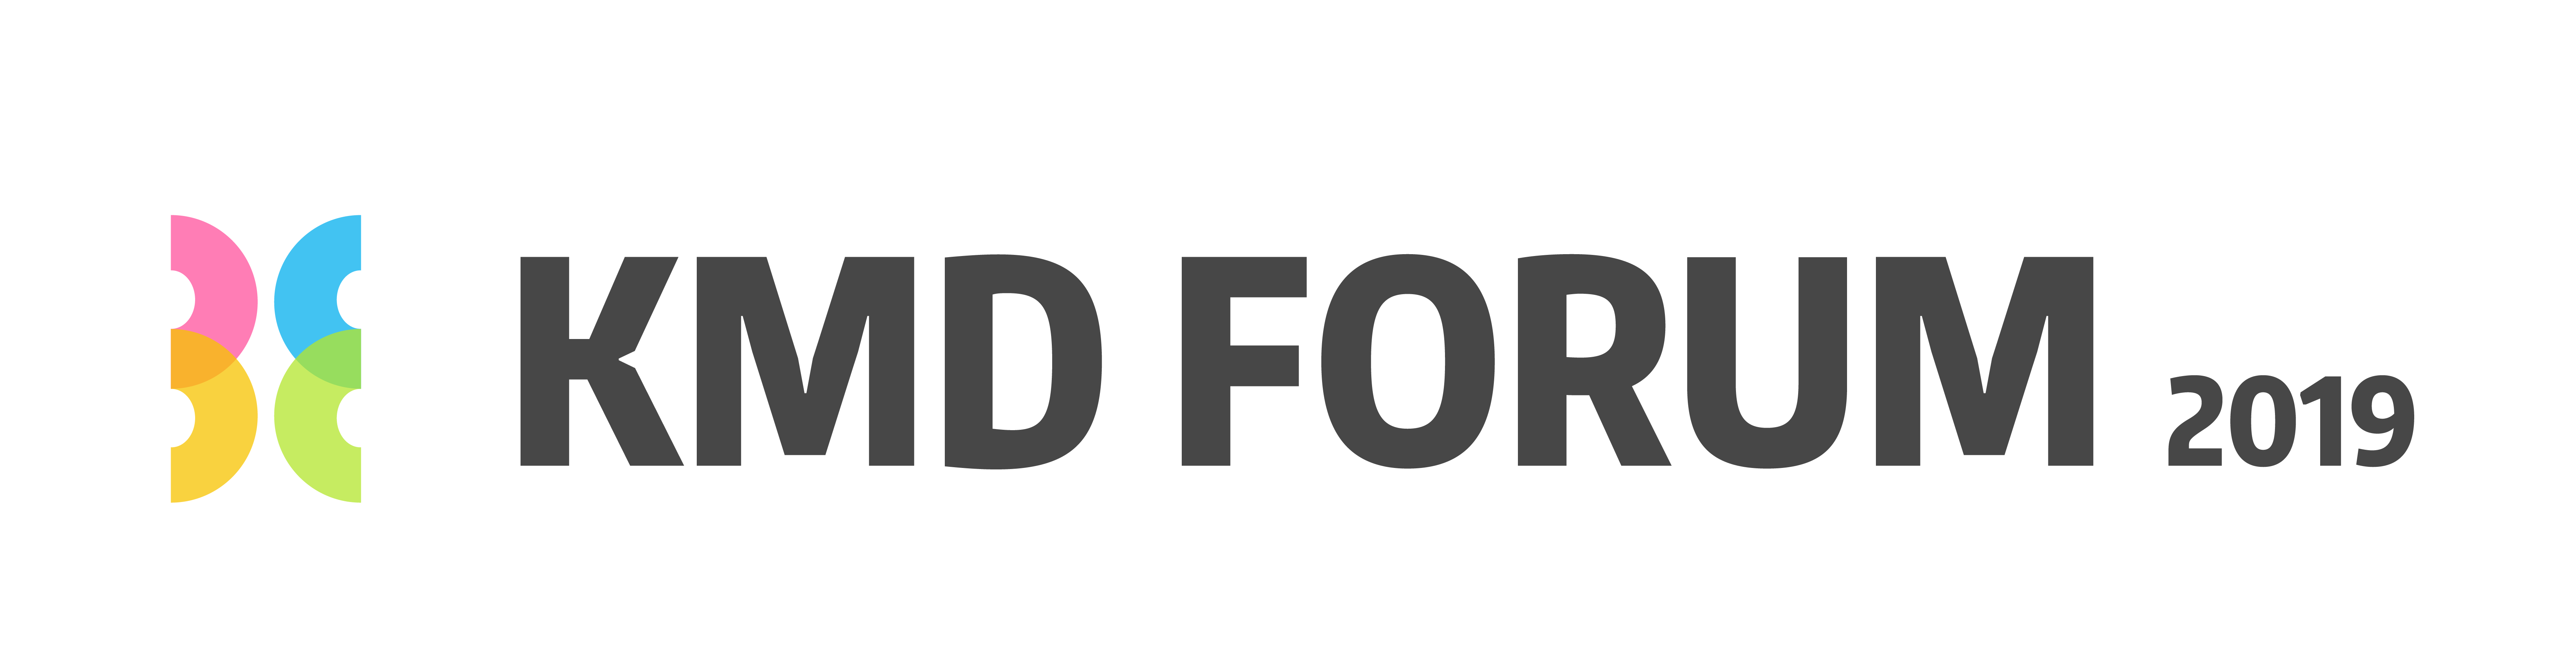 KMD Forum 2019